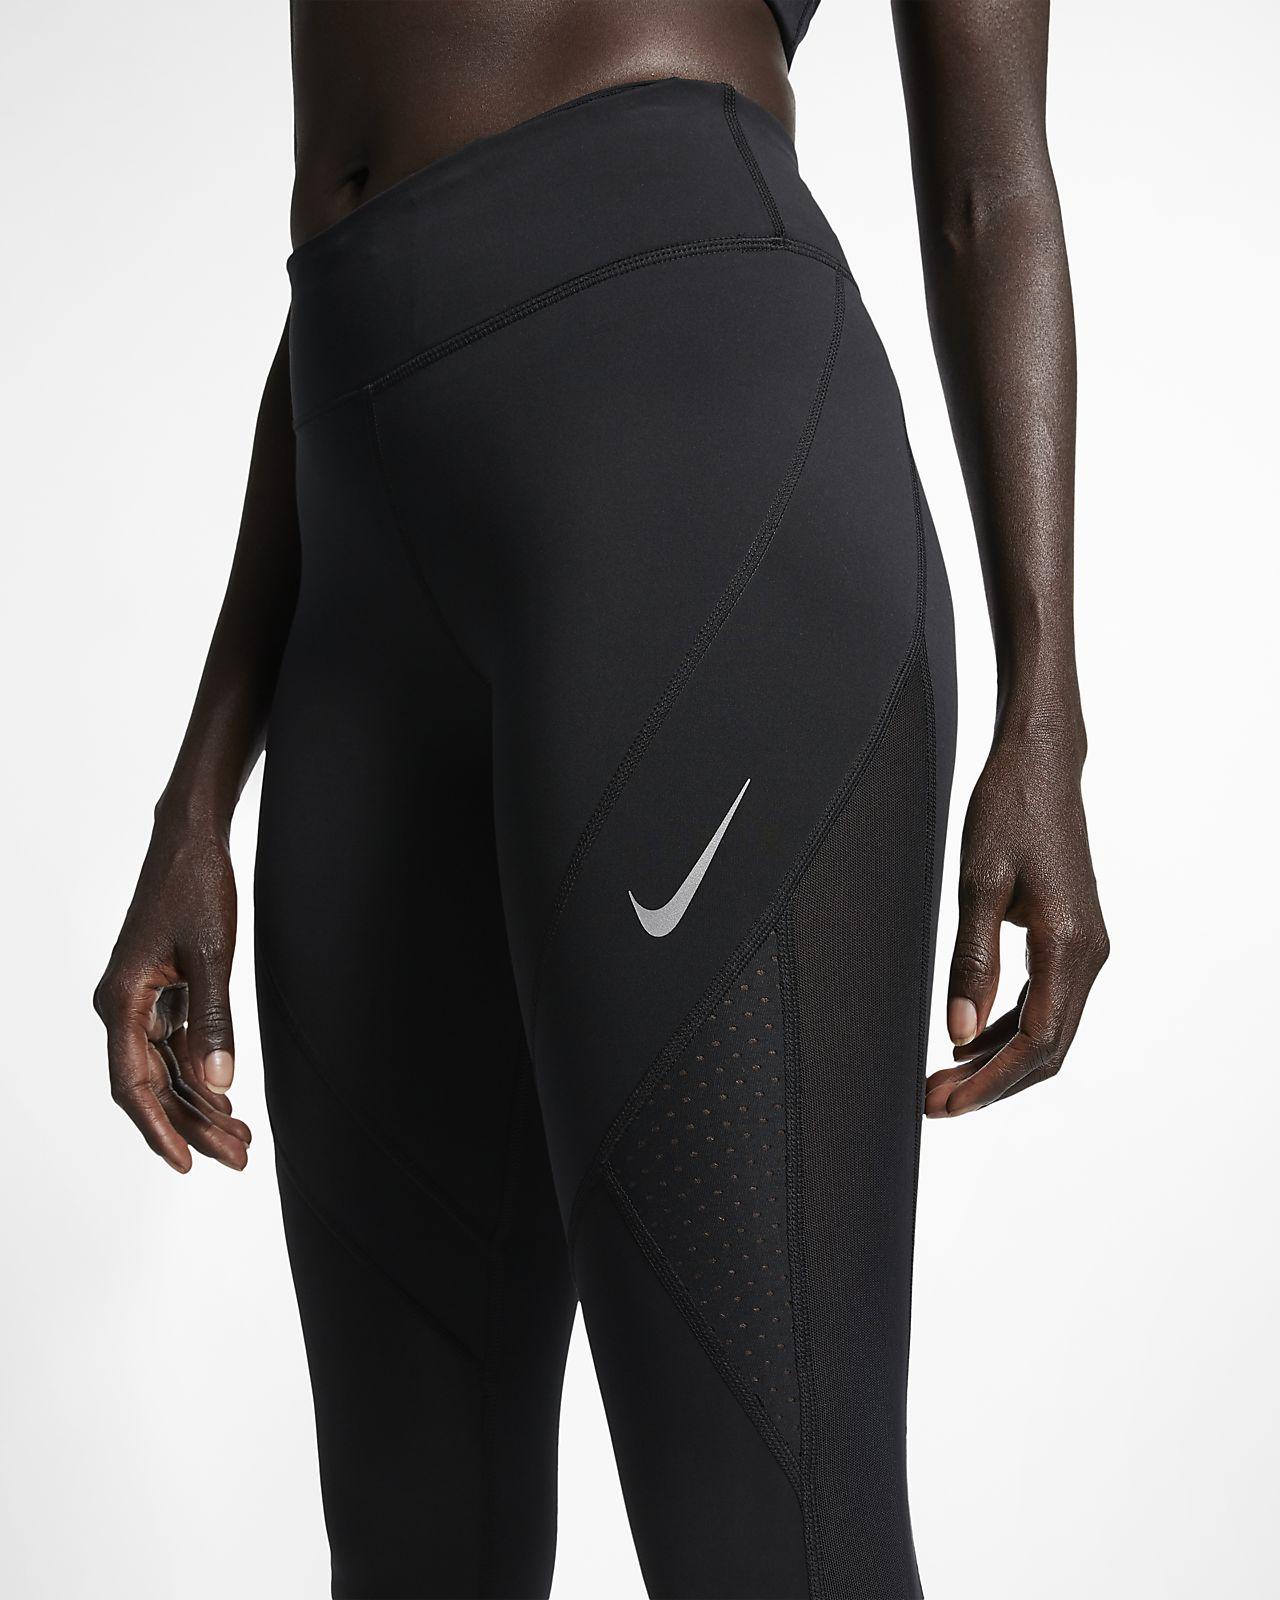 3fccc756 Damskie legginsy 7/8 do biegania Nike Epic Lux. Nike.com PL